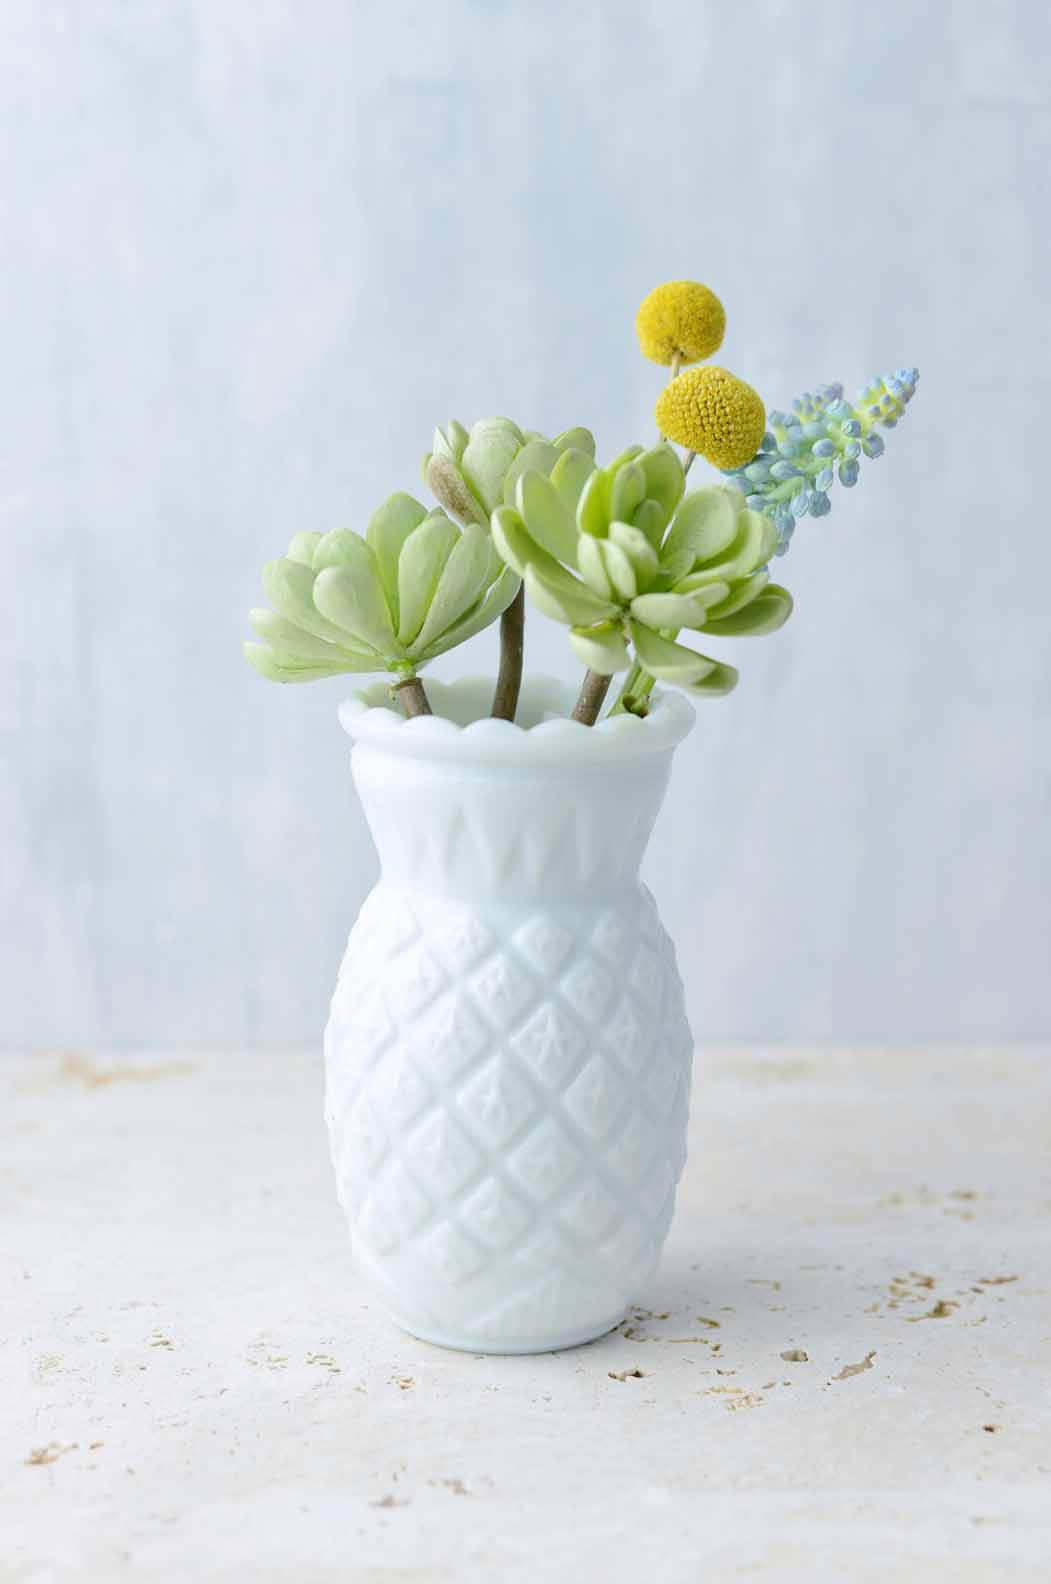 Pineapple Bud Vases Heirloom Milk Glass Vase 5.75in